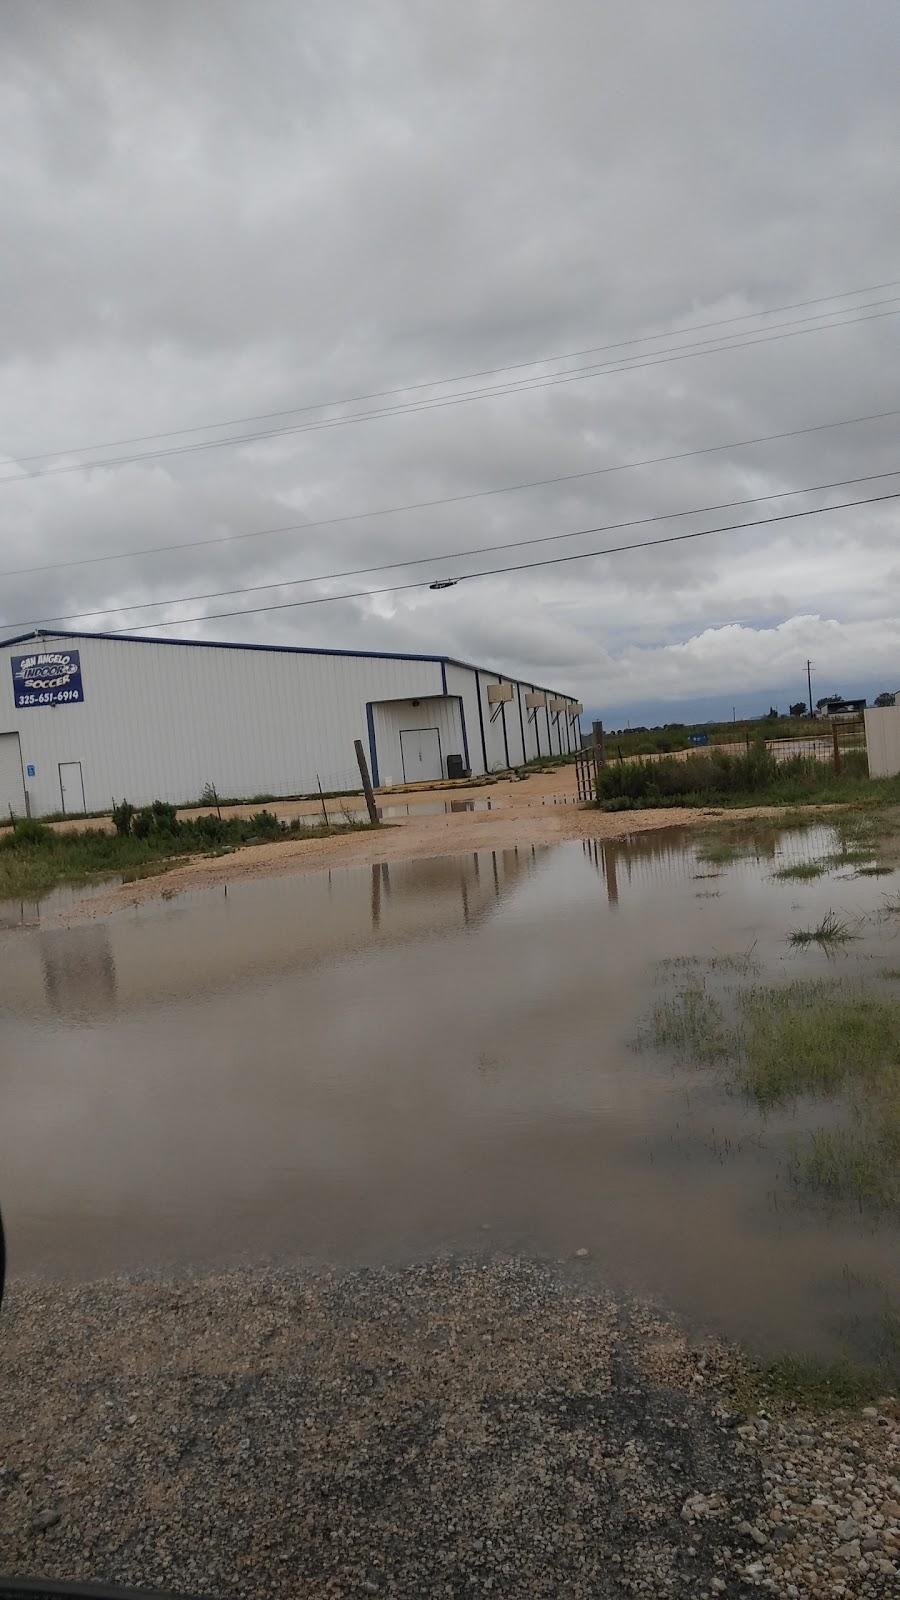 San Angelo Indoor Soccer - store    Photo 1 of 1   Address: 6033 Loop 306 S, San Angelo, TX 76905, USA   Phone: (325) 651-6914